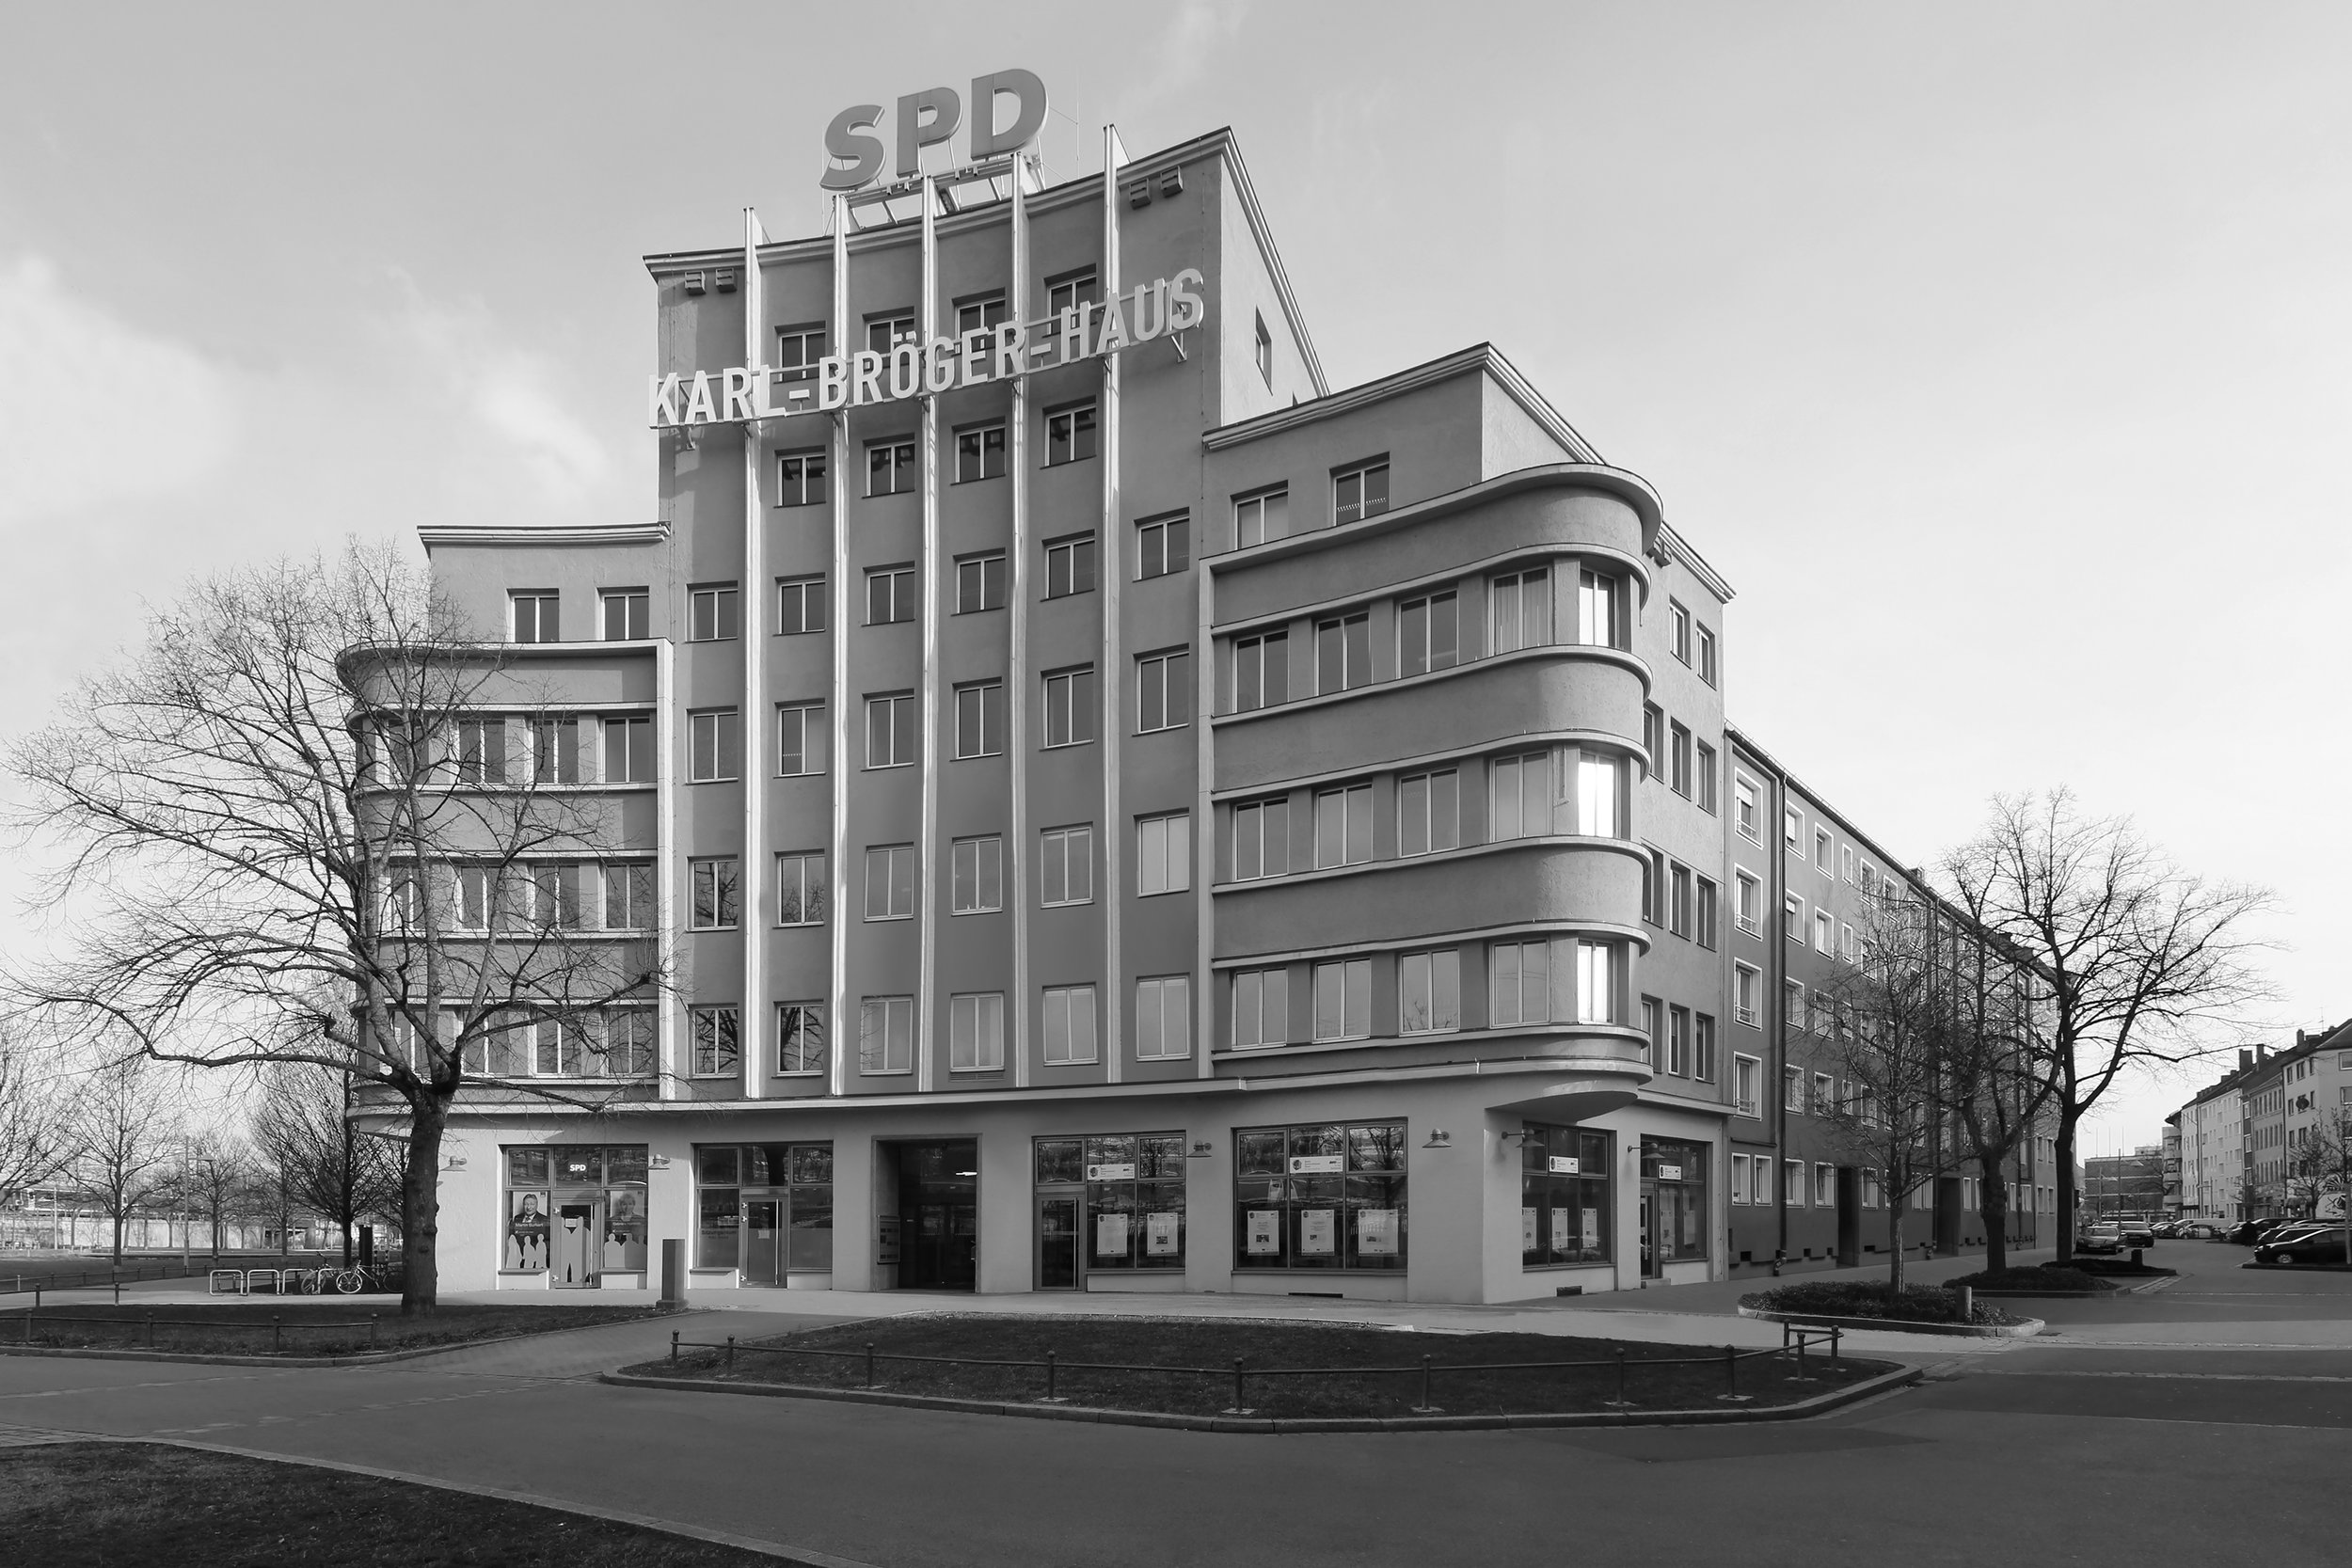 Karl Bröger House